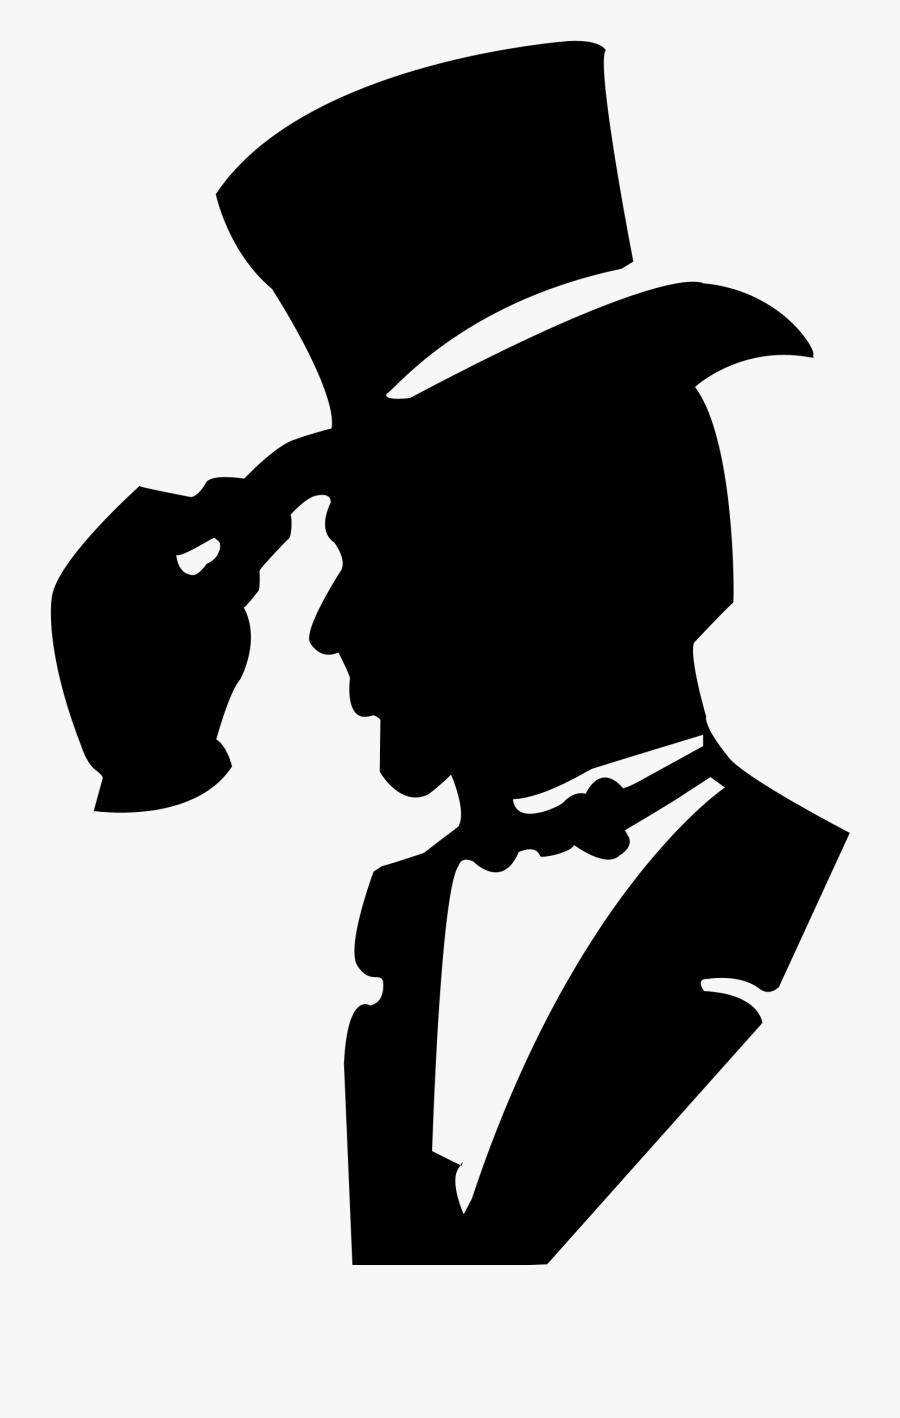 T-shirt Hat Suit Clothing - Black And White Gentleman Clipart, Transparent Clipart